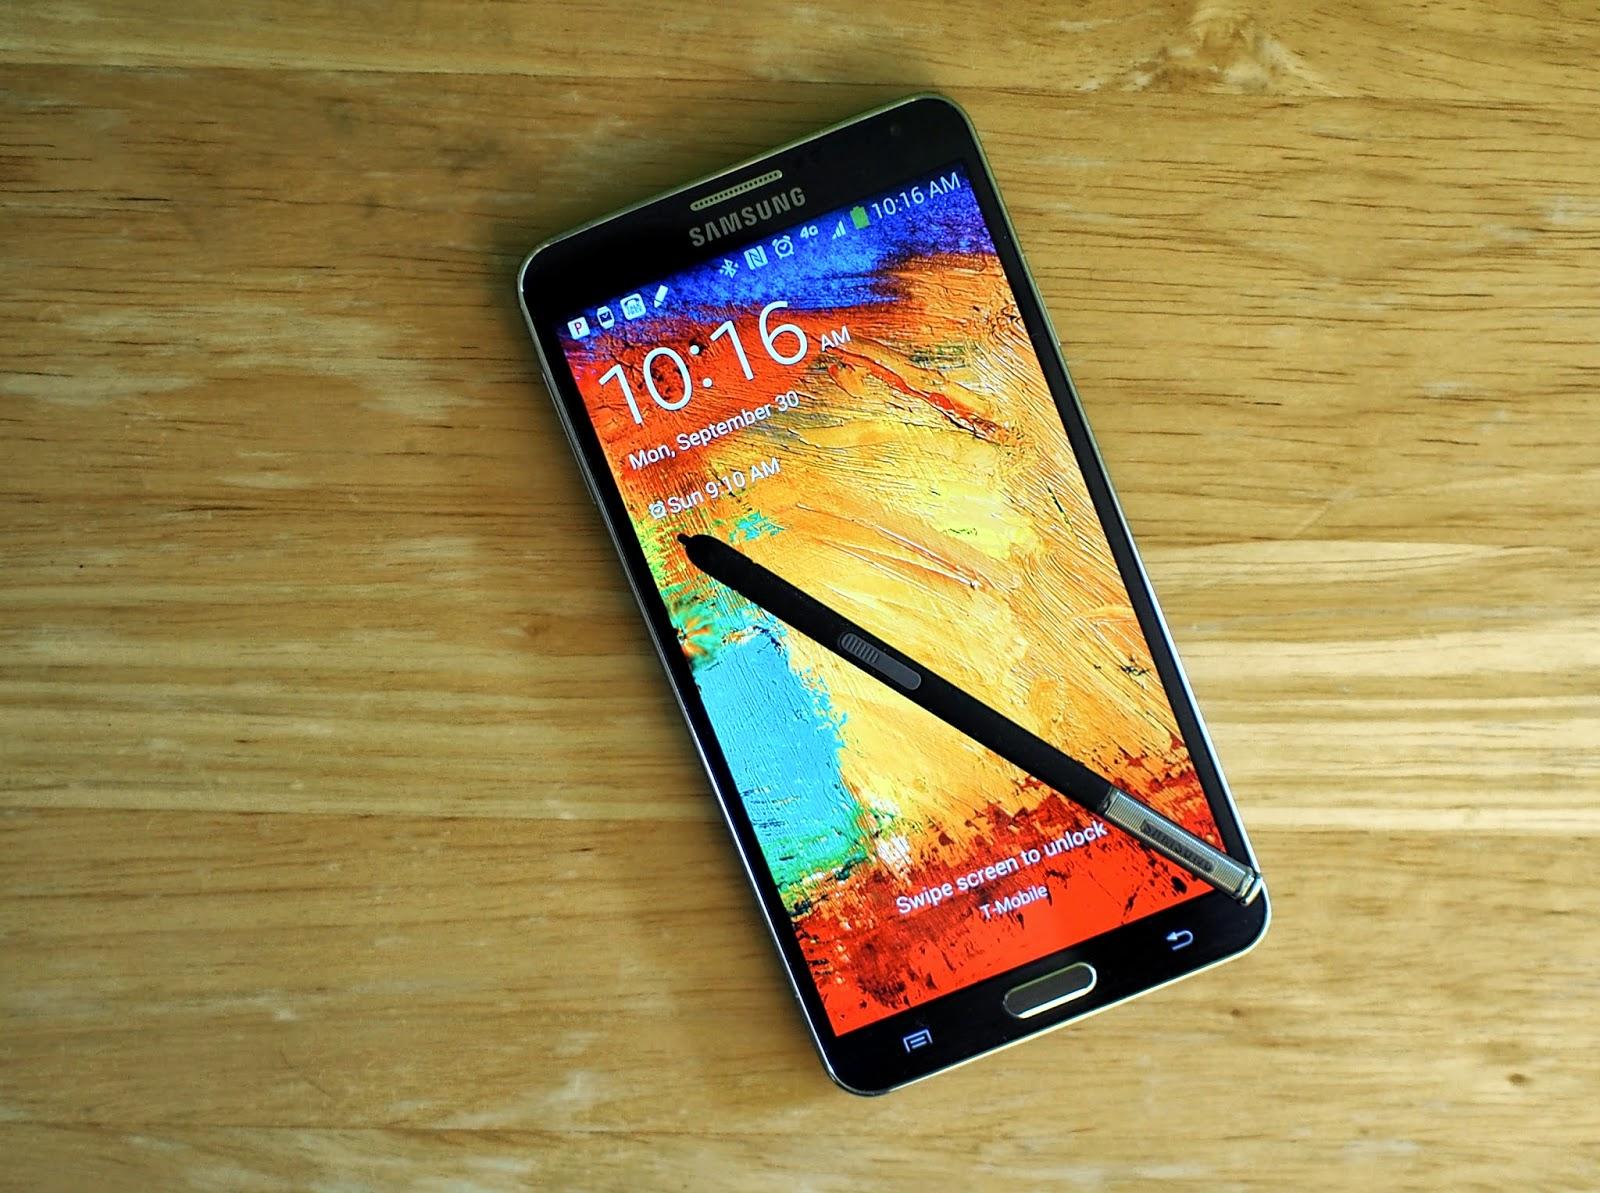 Samsung Galaxy Note 4, Smartphone Premium Harga 9 jutaan